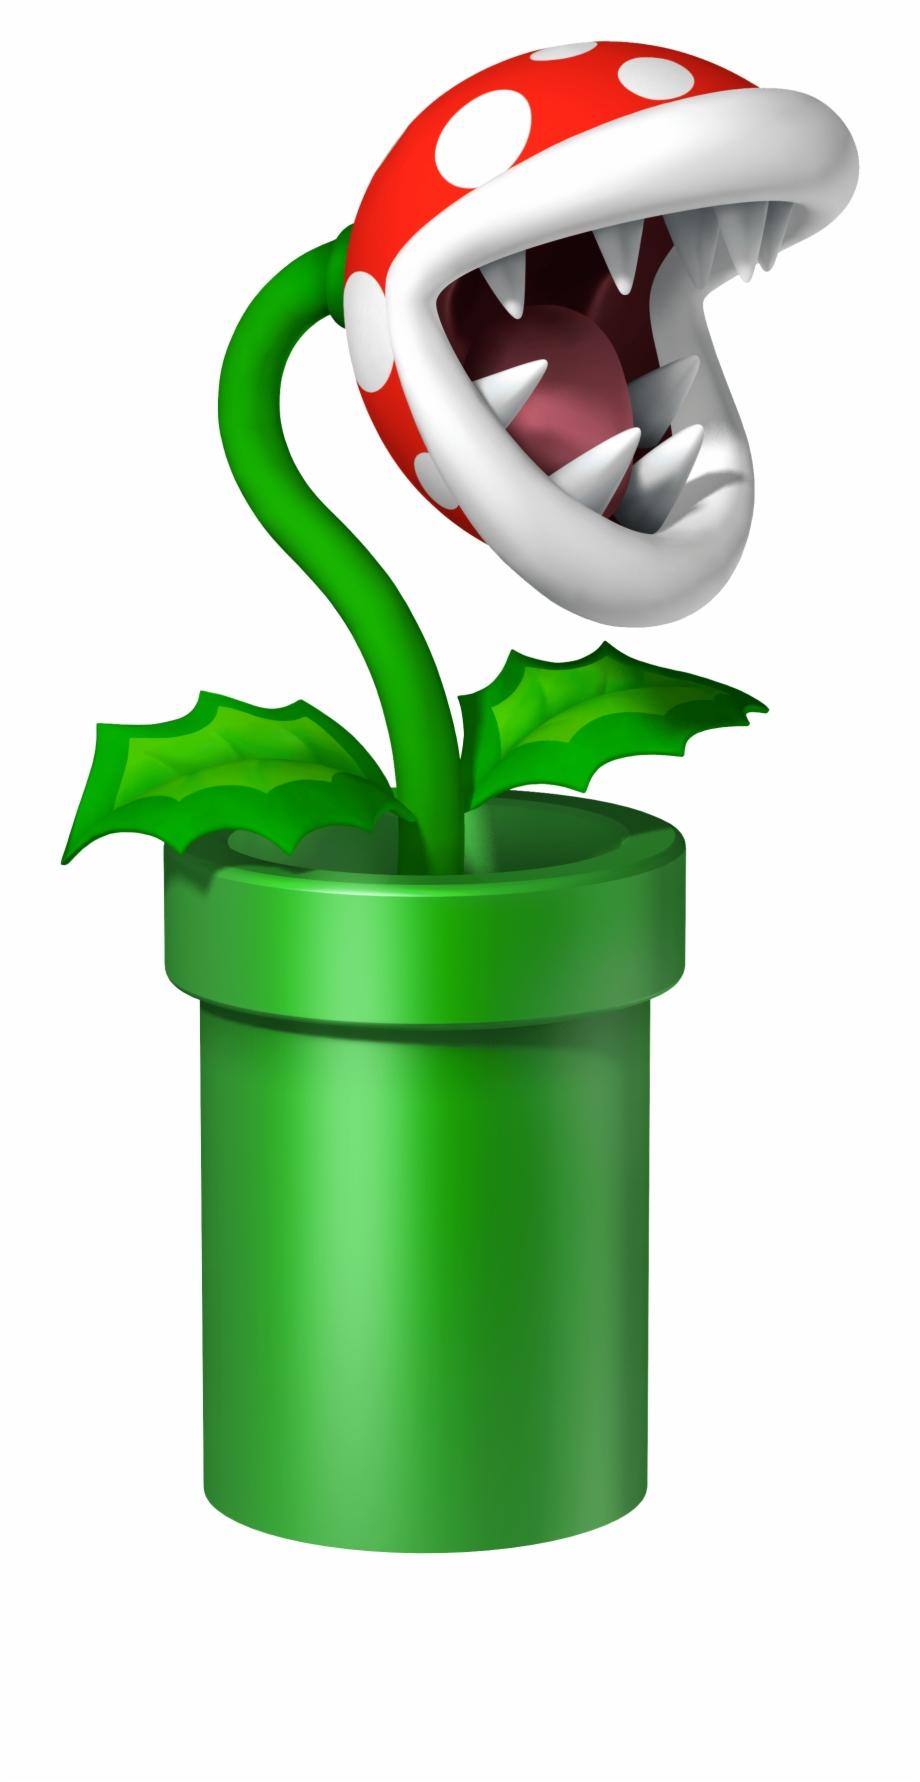 Download Free png Super Mario Piranha Plant Free PNG Images.